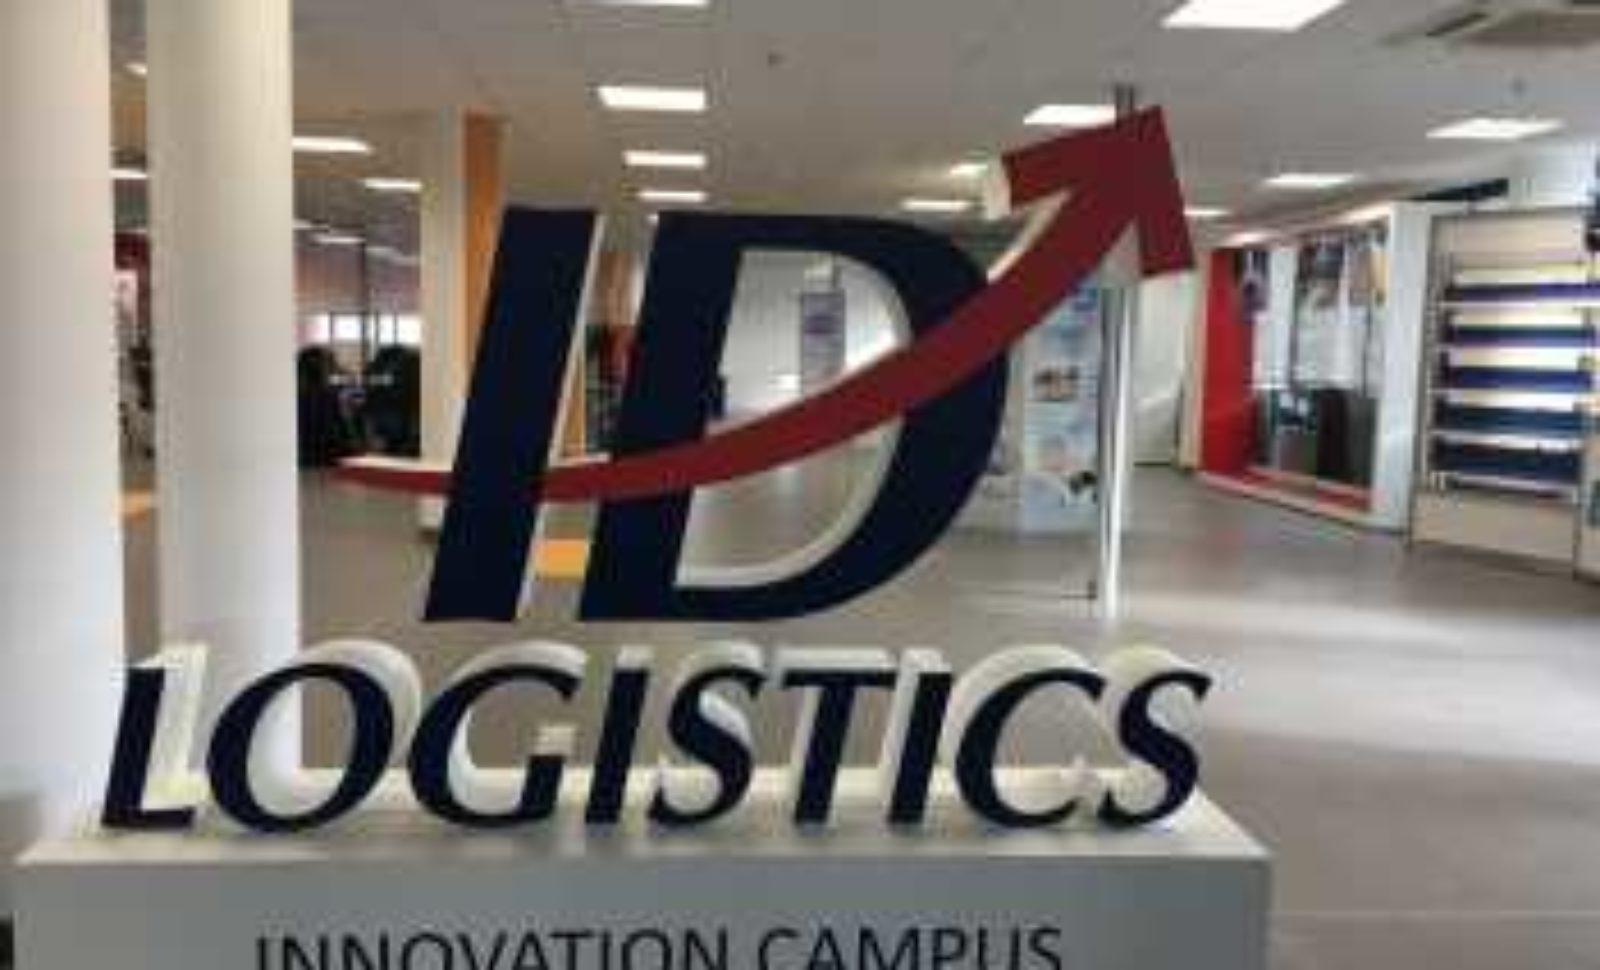 Neuste Innovationen live erleben: ID Logistics gründet Innovations-Campus